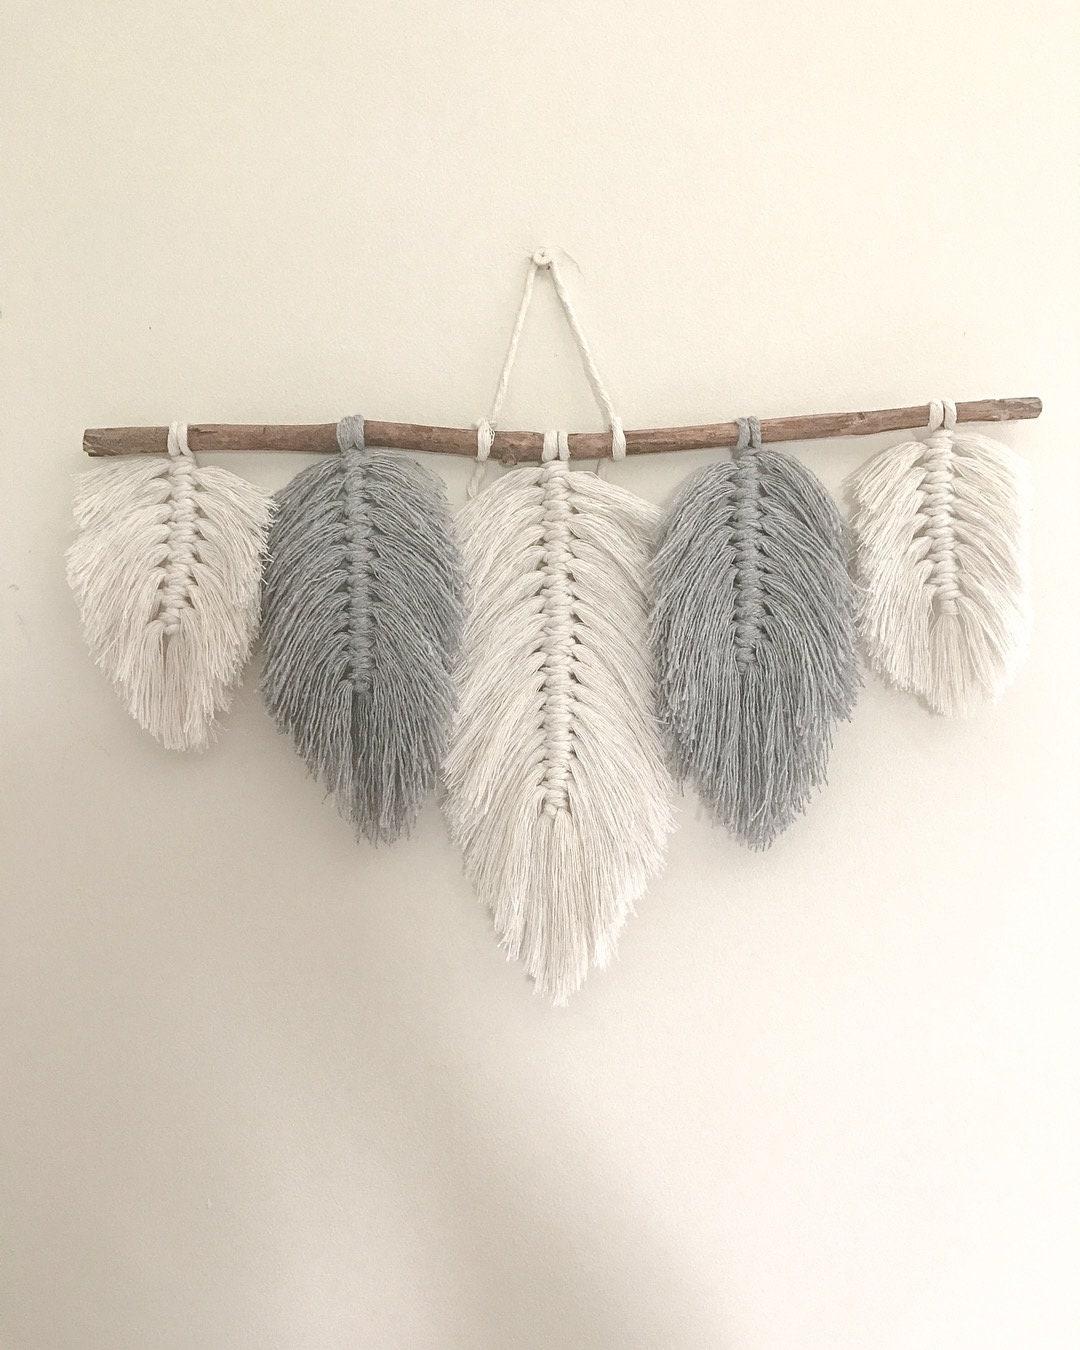 Macrame Feathers Macrame Feathers Wall Hanging Wall Etsy